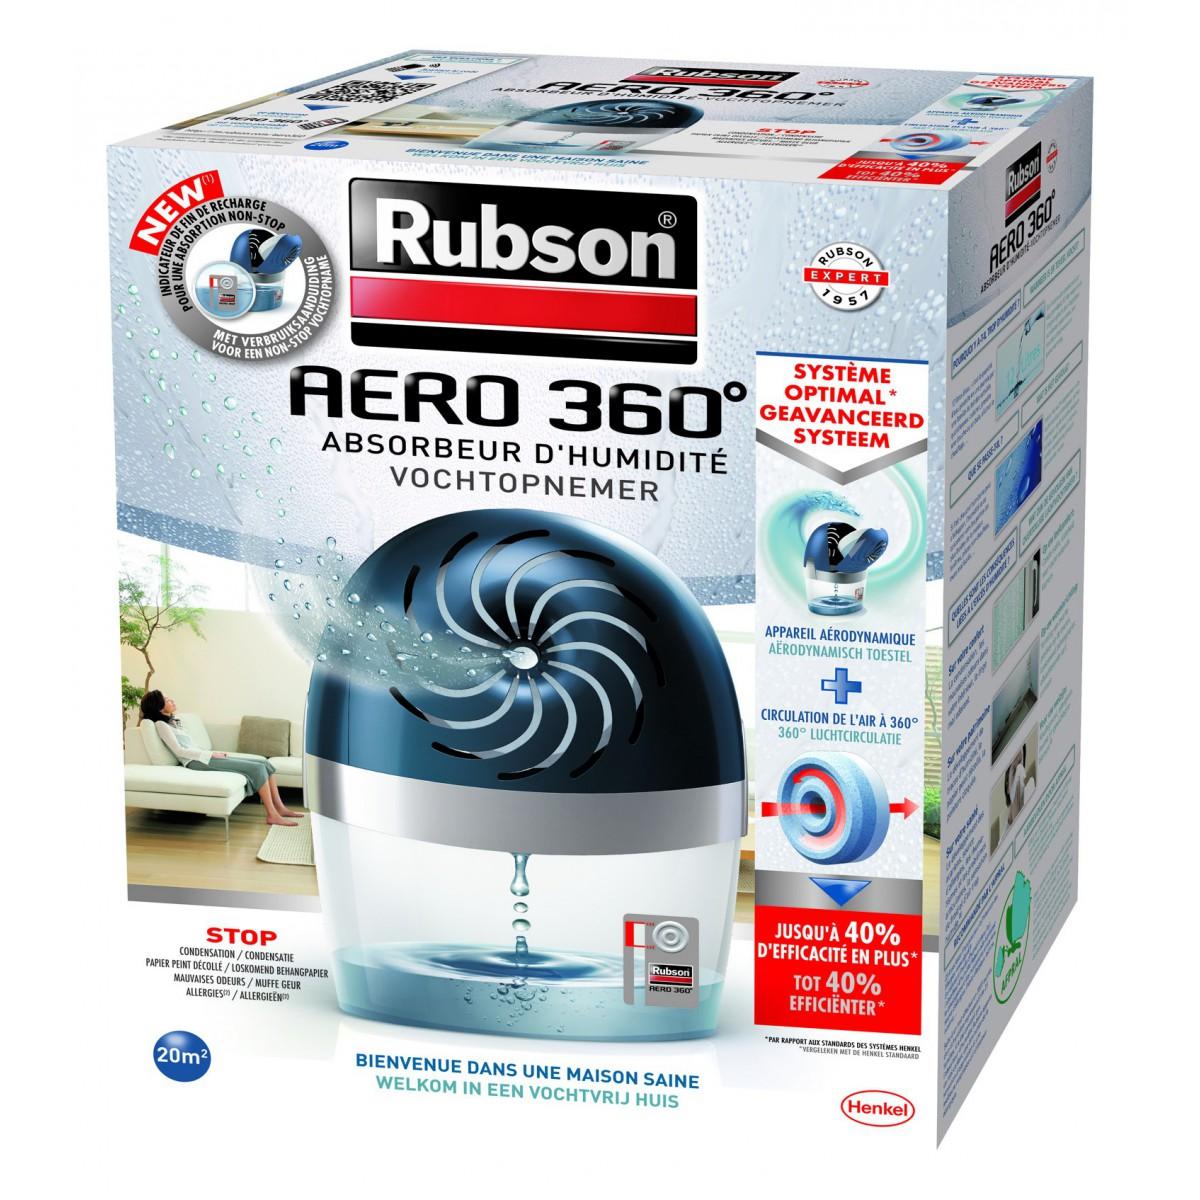 déshumidificateur rubson aero 360